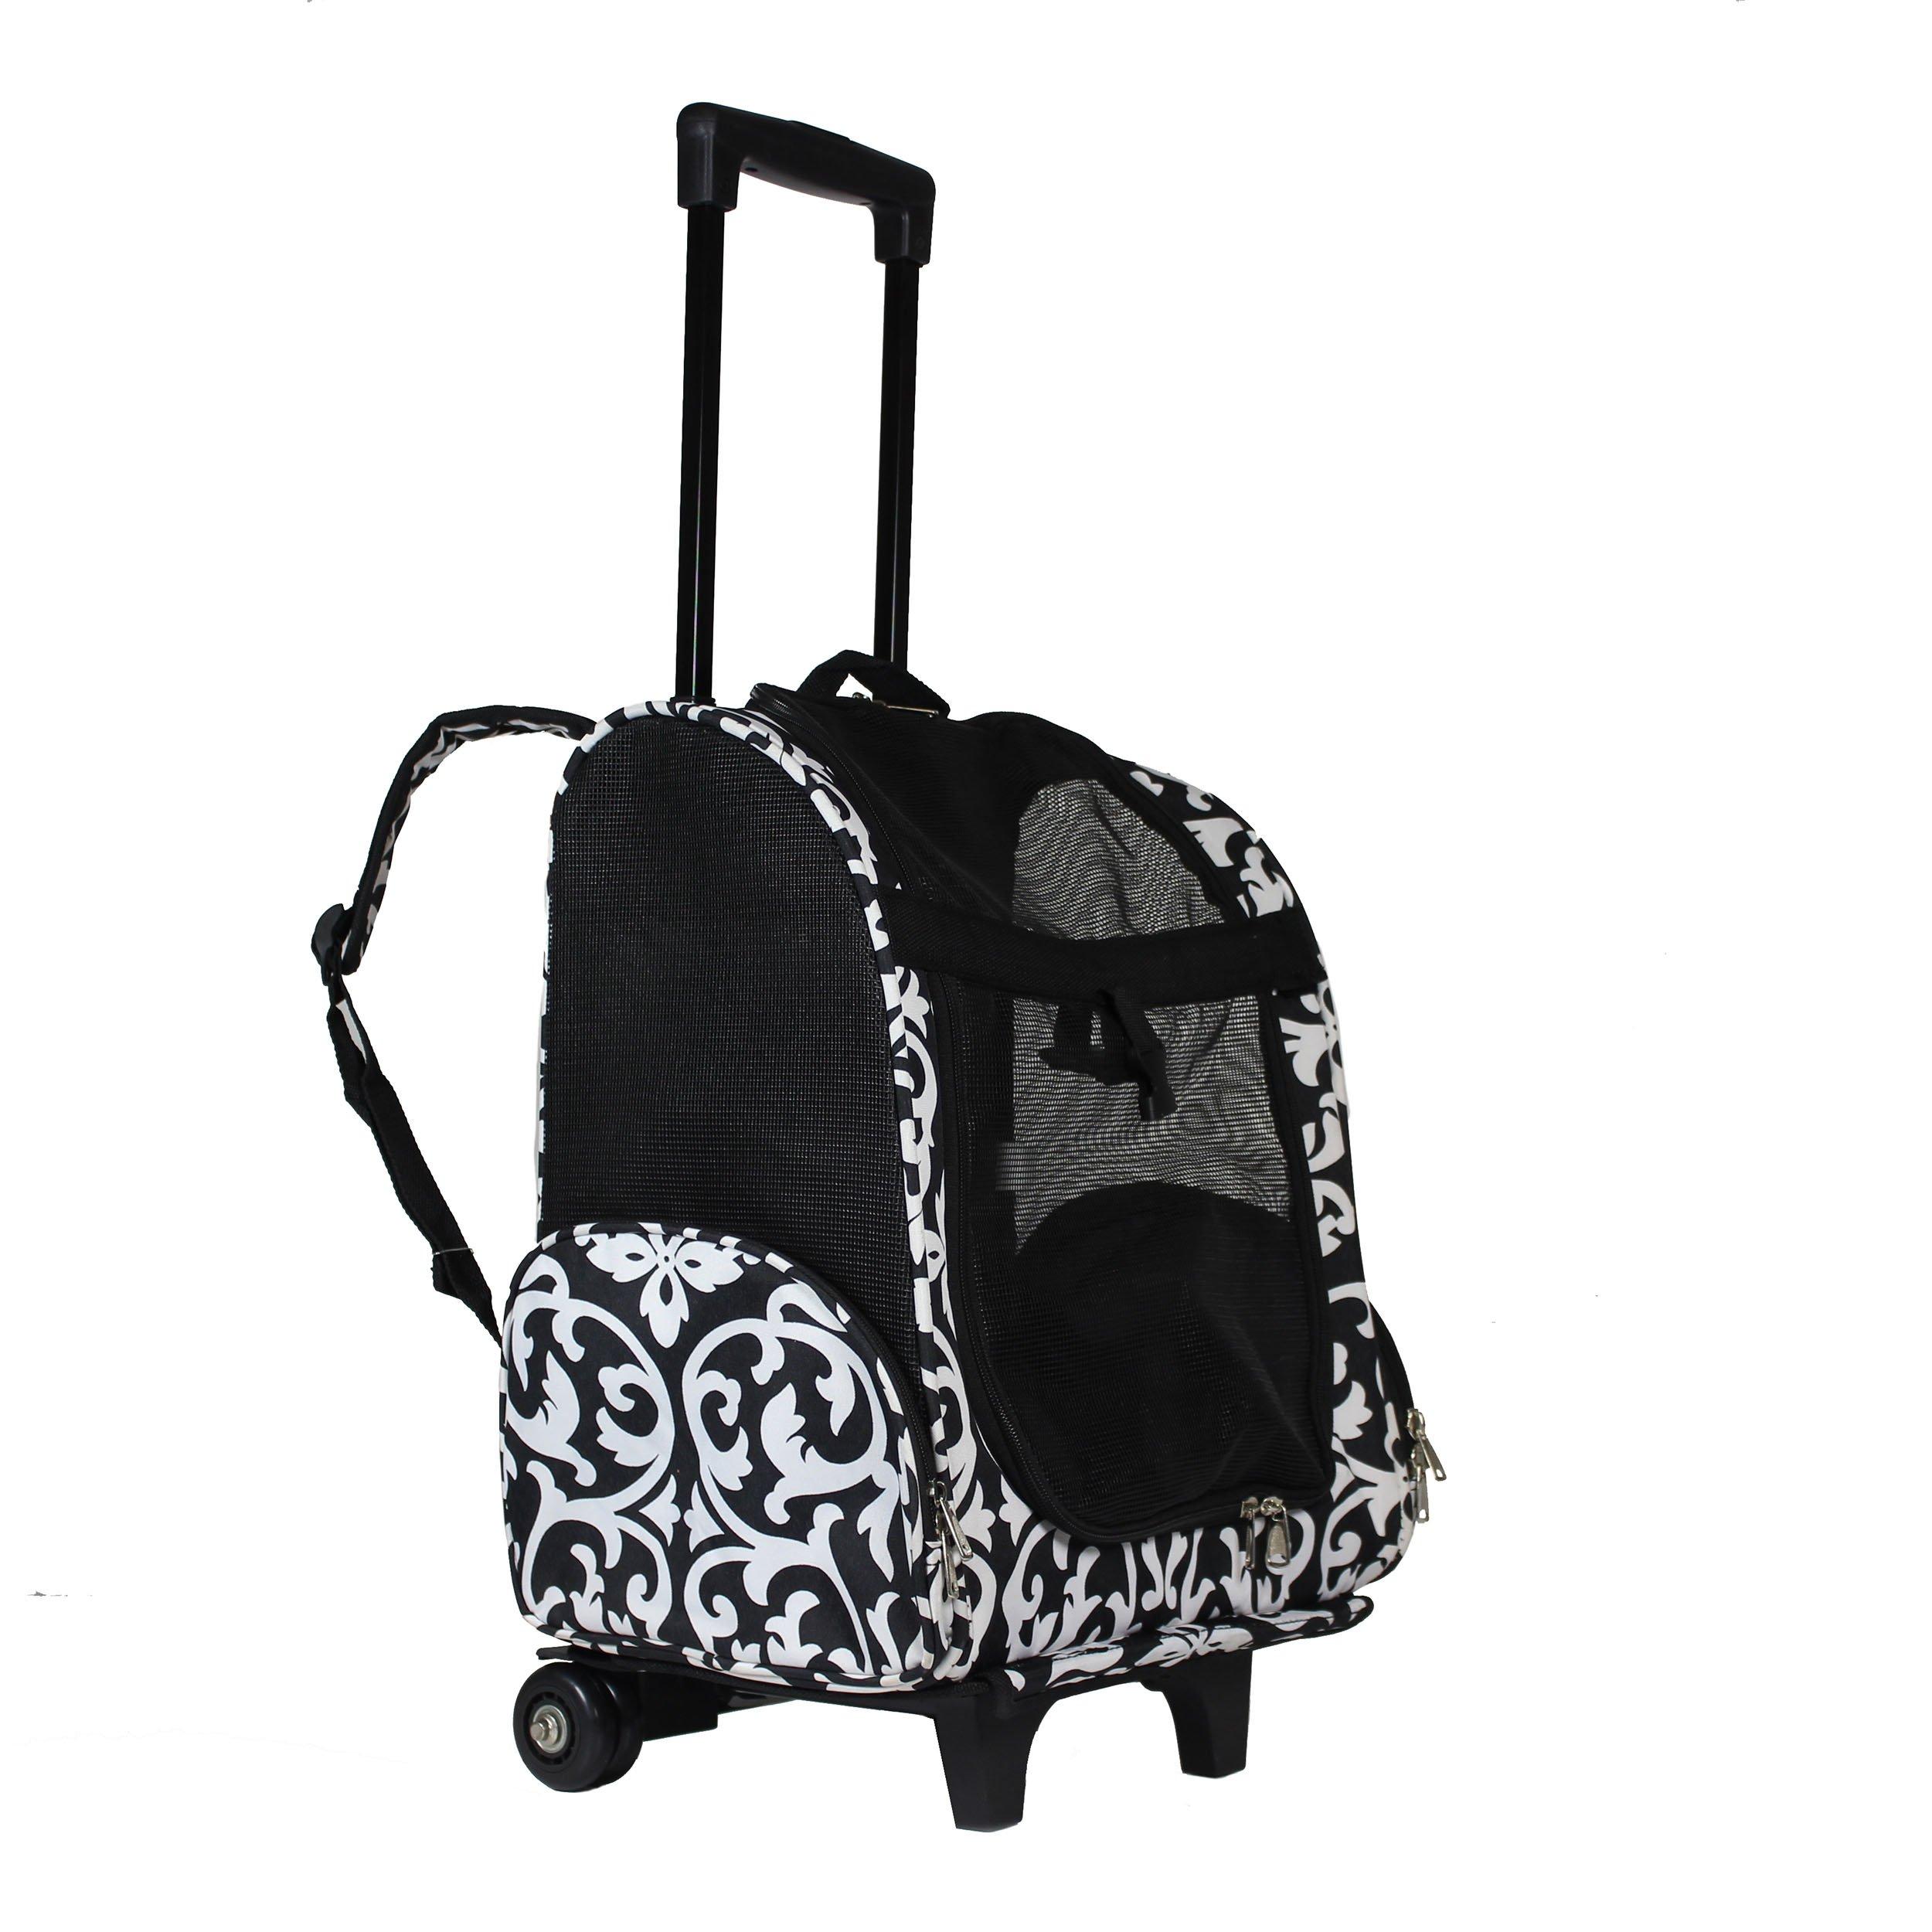 World Traveler Women's 18'' Rolling Pet Carrier Backpack Convertible-Black Trim Damask Fashion, One Size